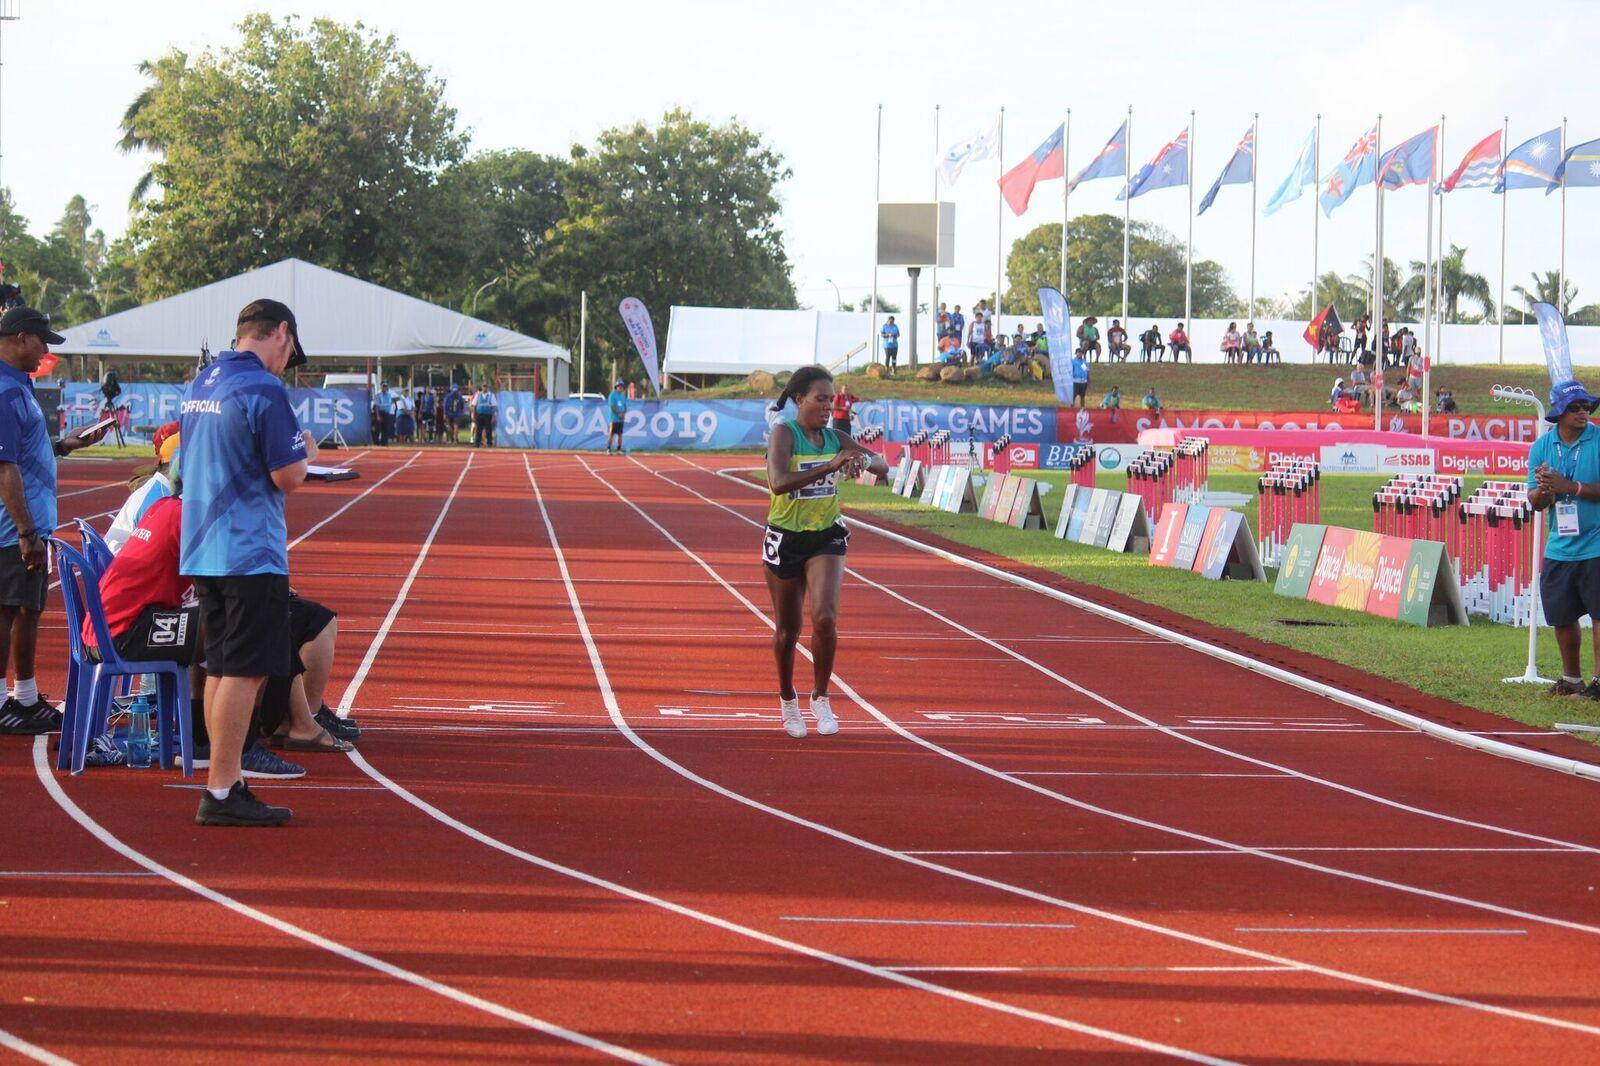 Women's 10,000m champion Sharon Kikini Firisua checks her time as she crosses the line ©Games News Service